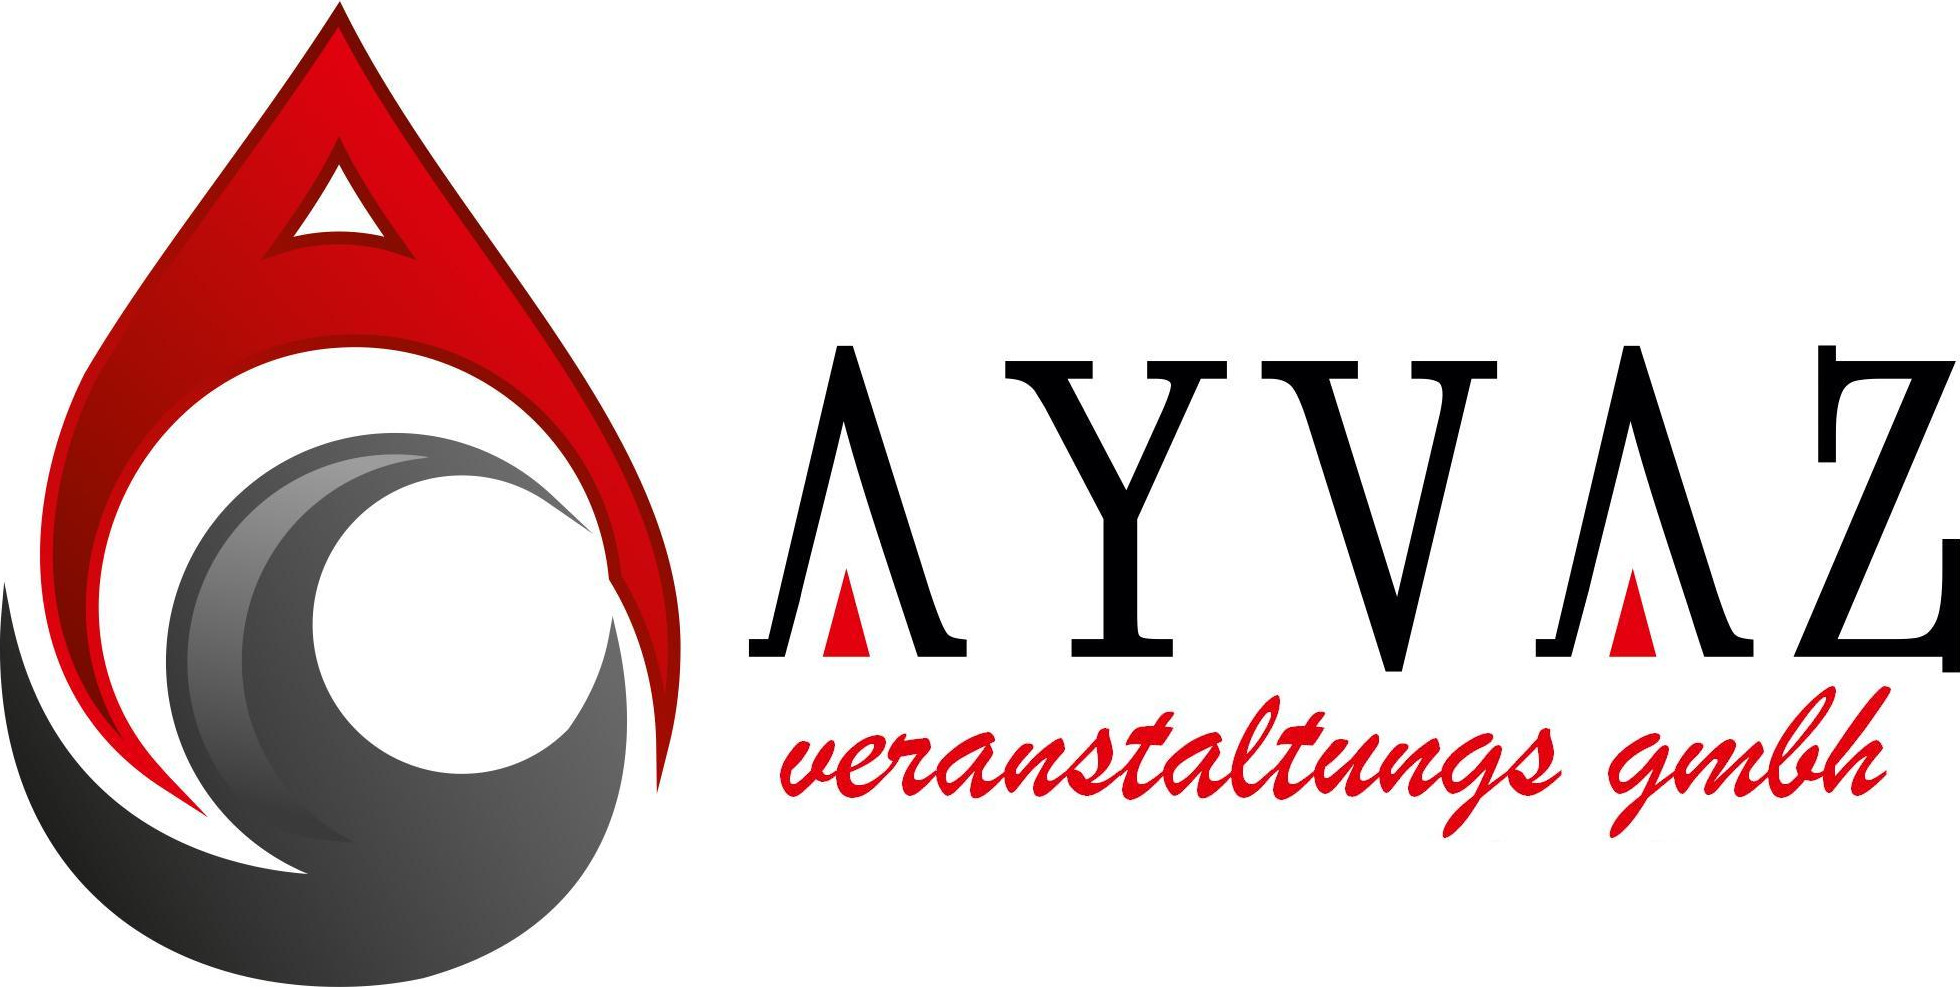 Ayaz - Marktbudenverleih und Flohmärkte in Berlin